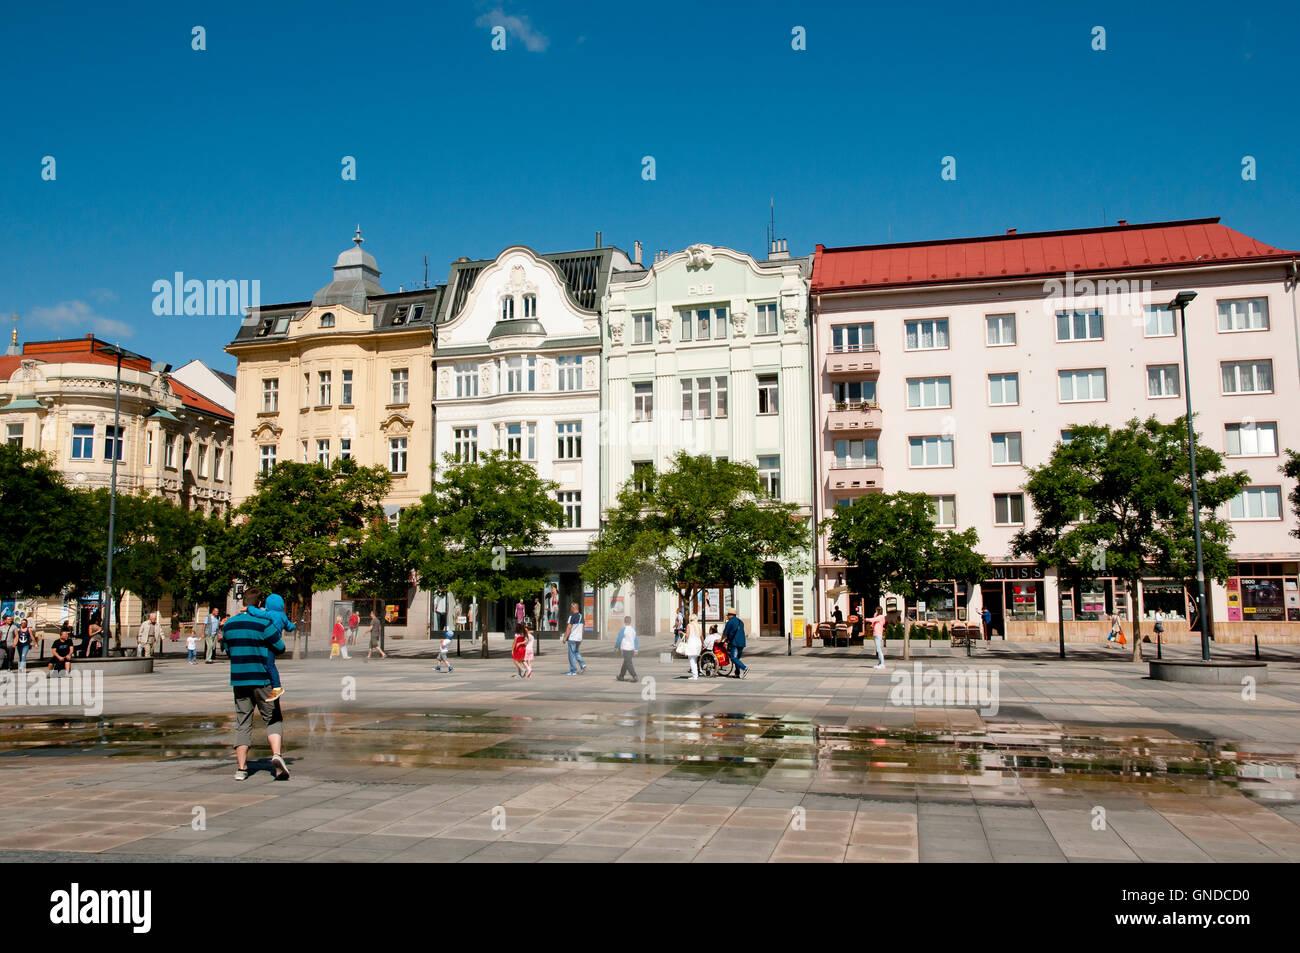 Masaryk Square - Ostrava - Czech Republic - Stock Image